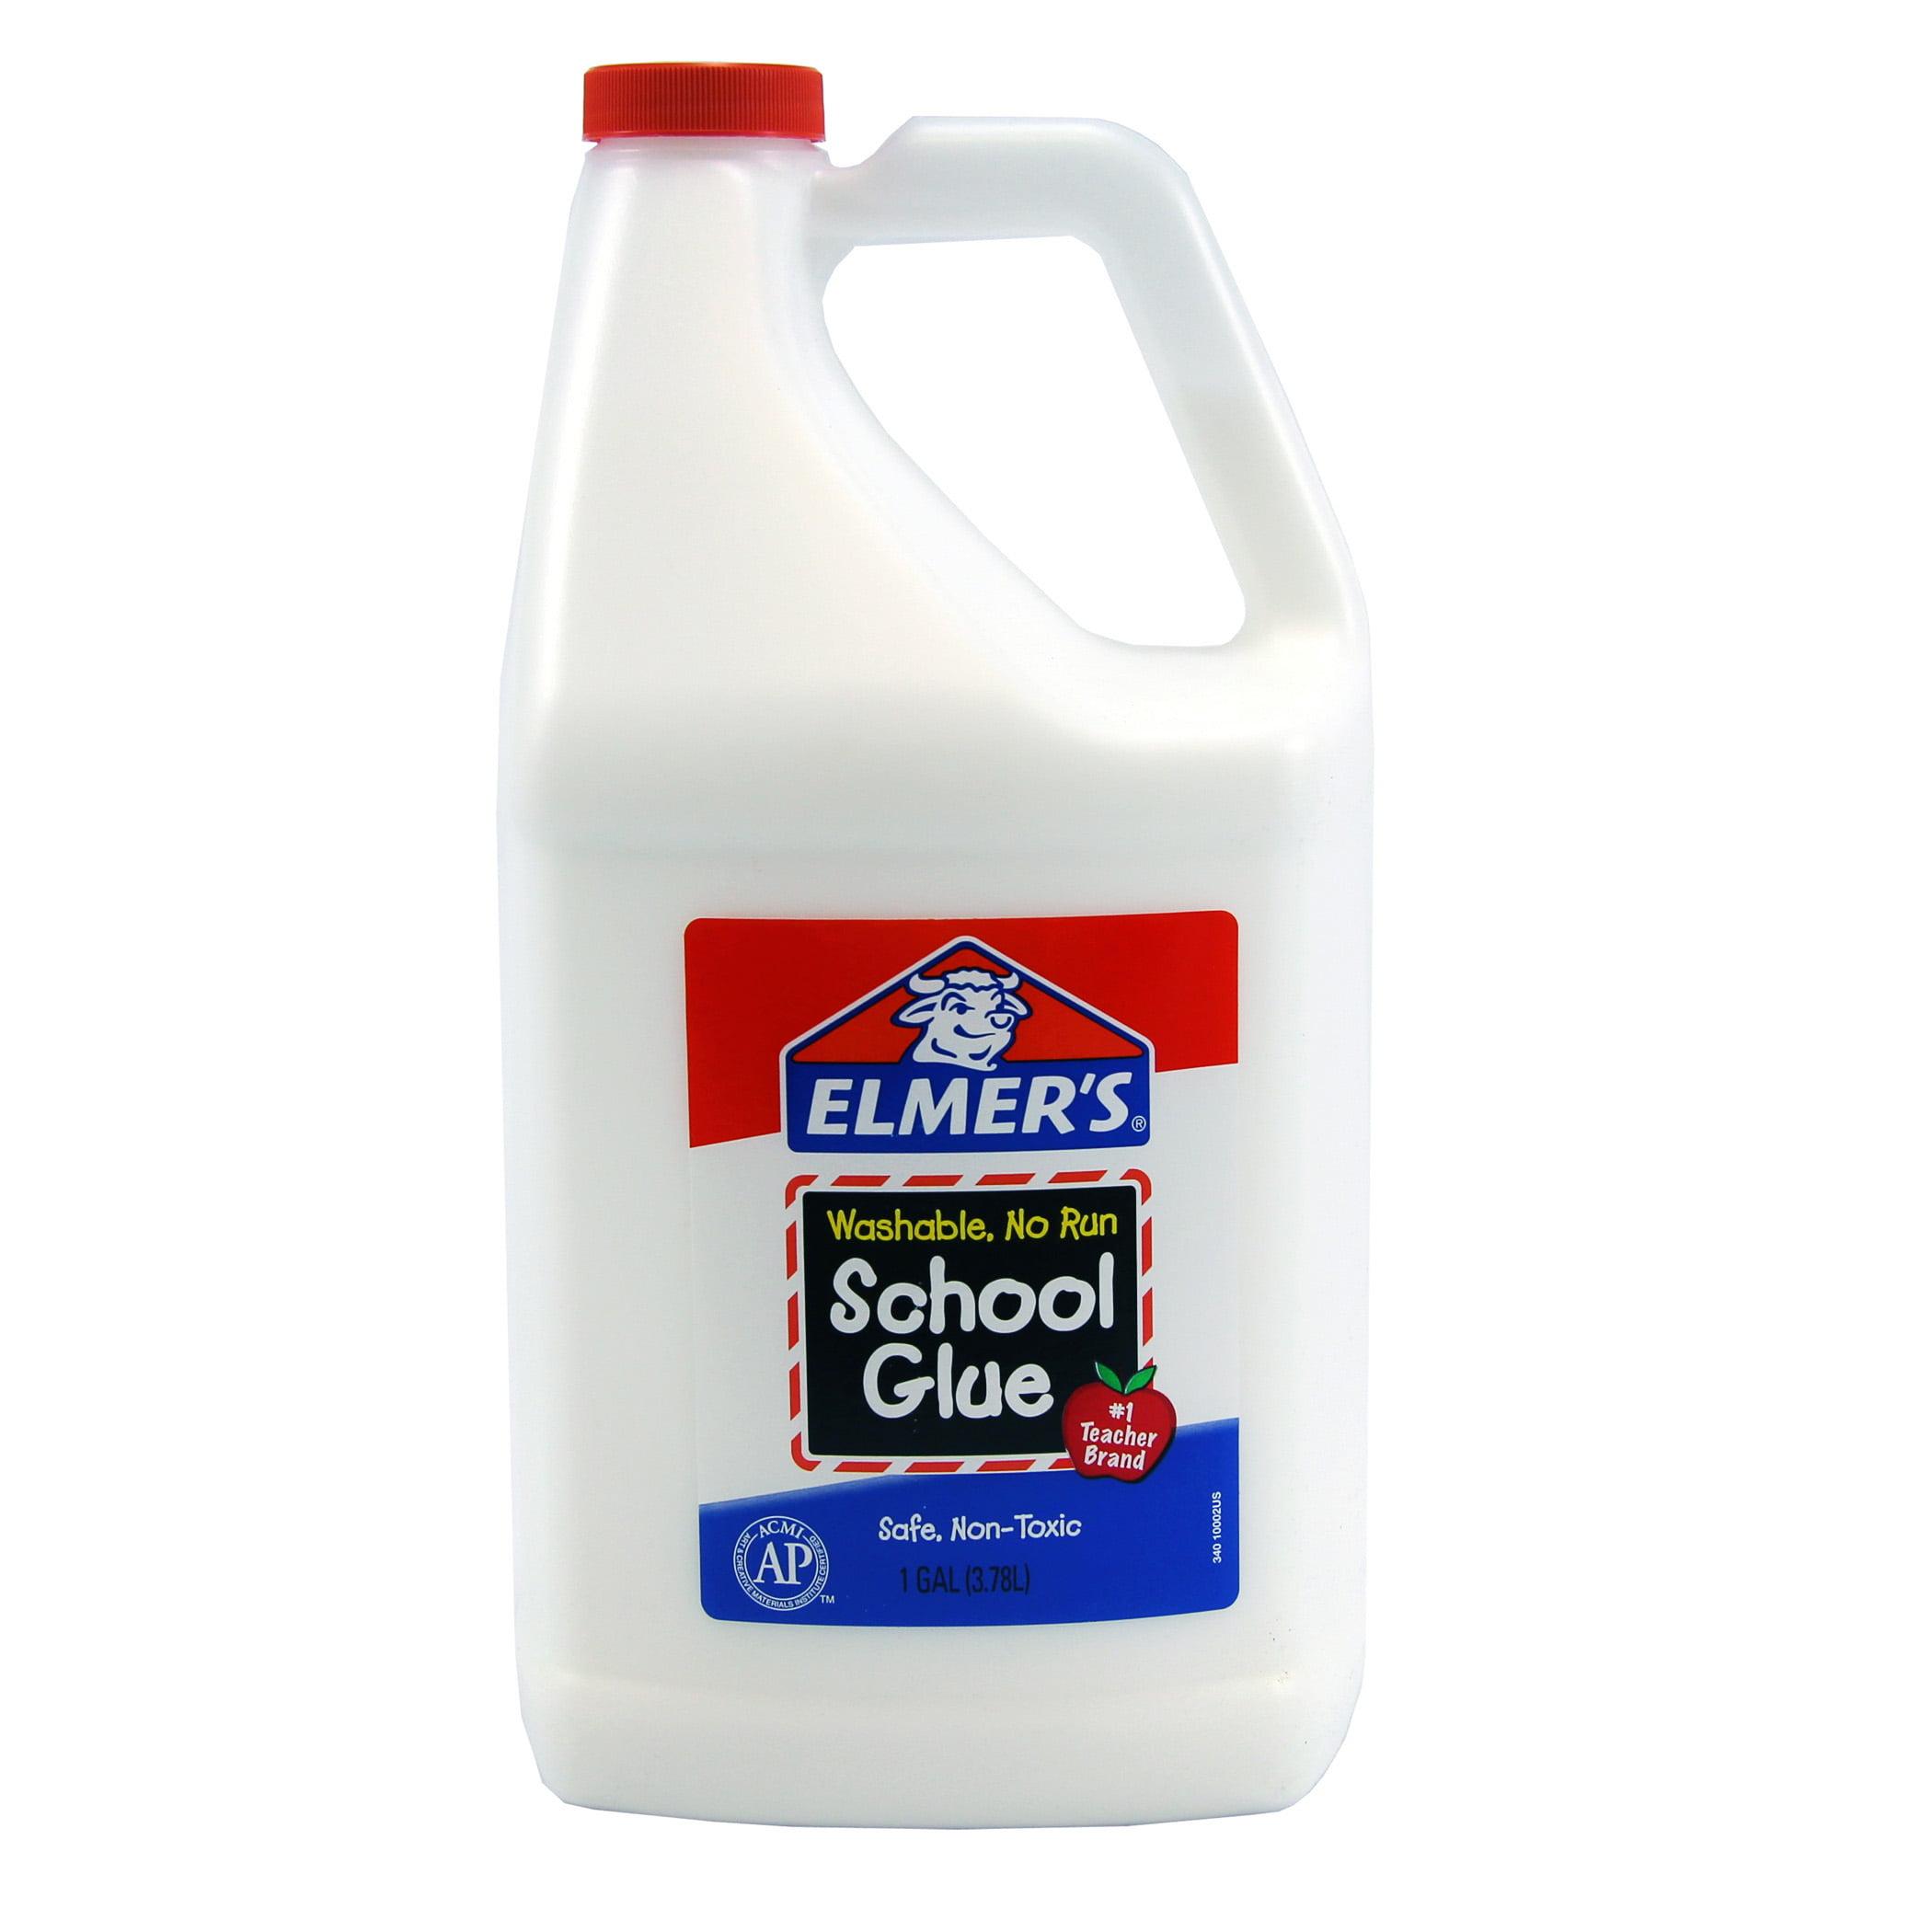 Elmer's Washable School Glue, Gallon